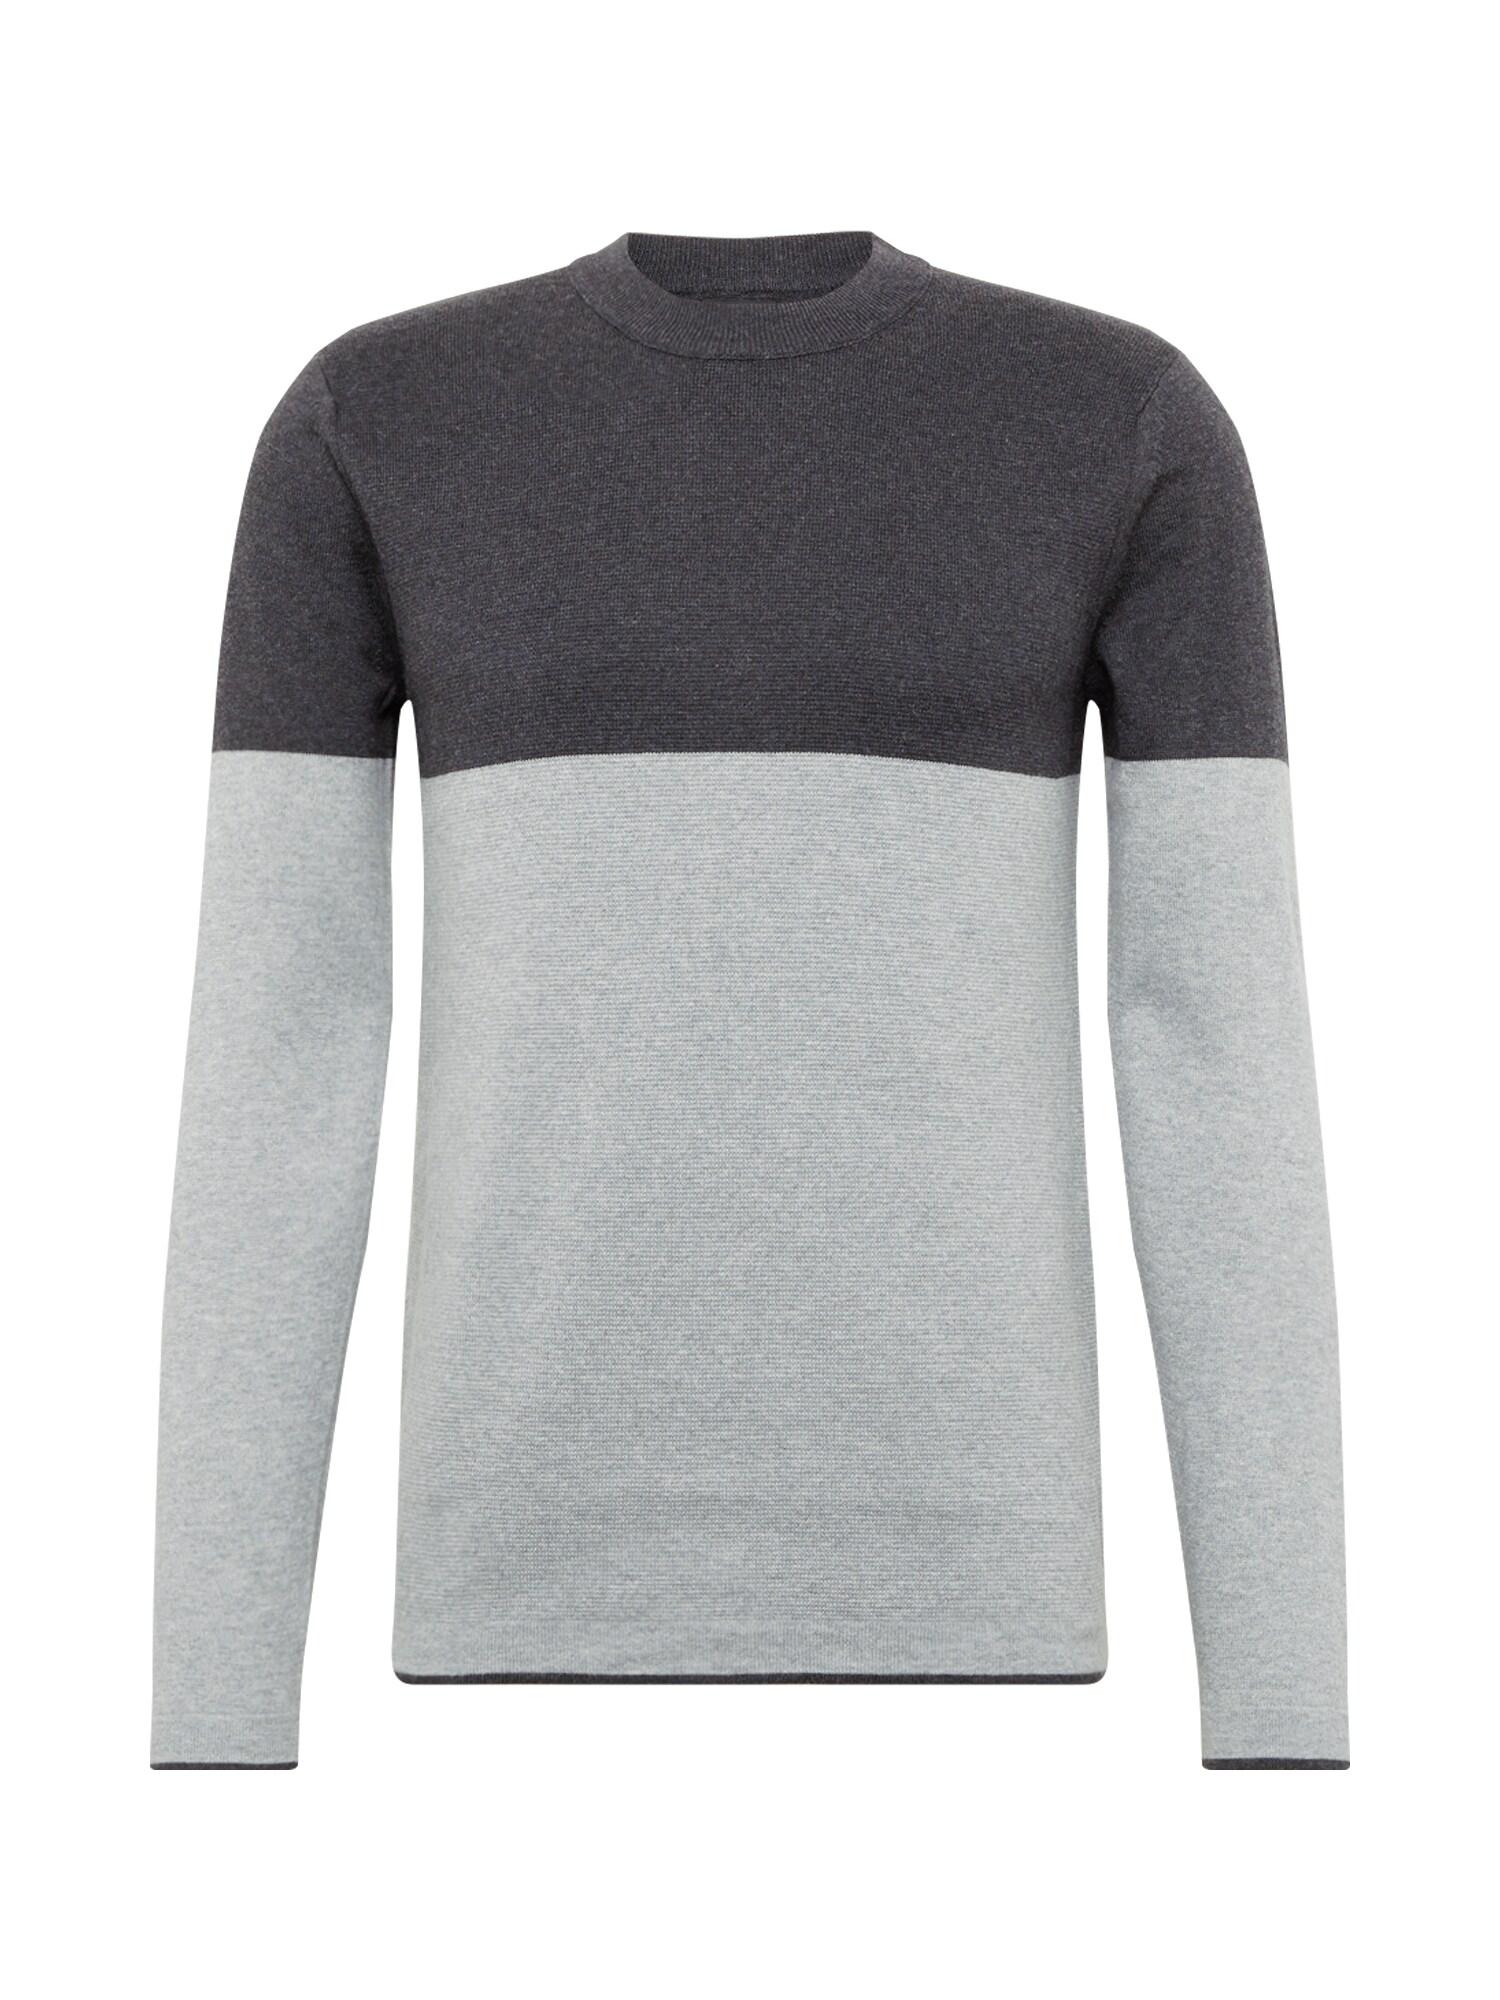 BURTON MENSWEAR LONDON Pulover 'tate colourblock charcoal grey'  gri